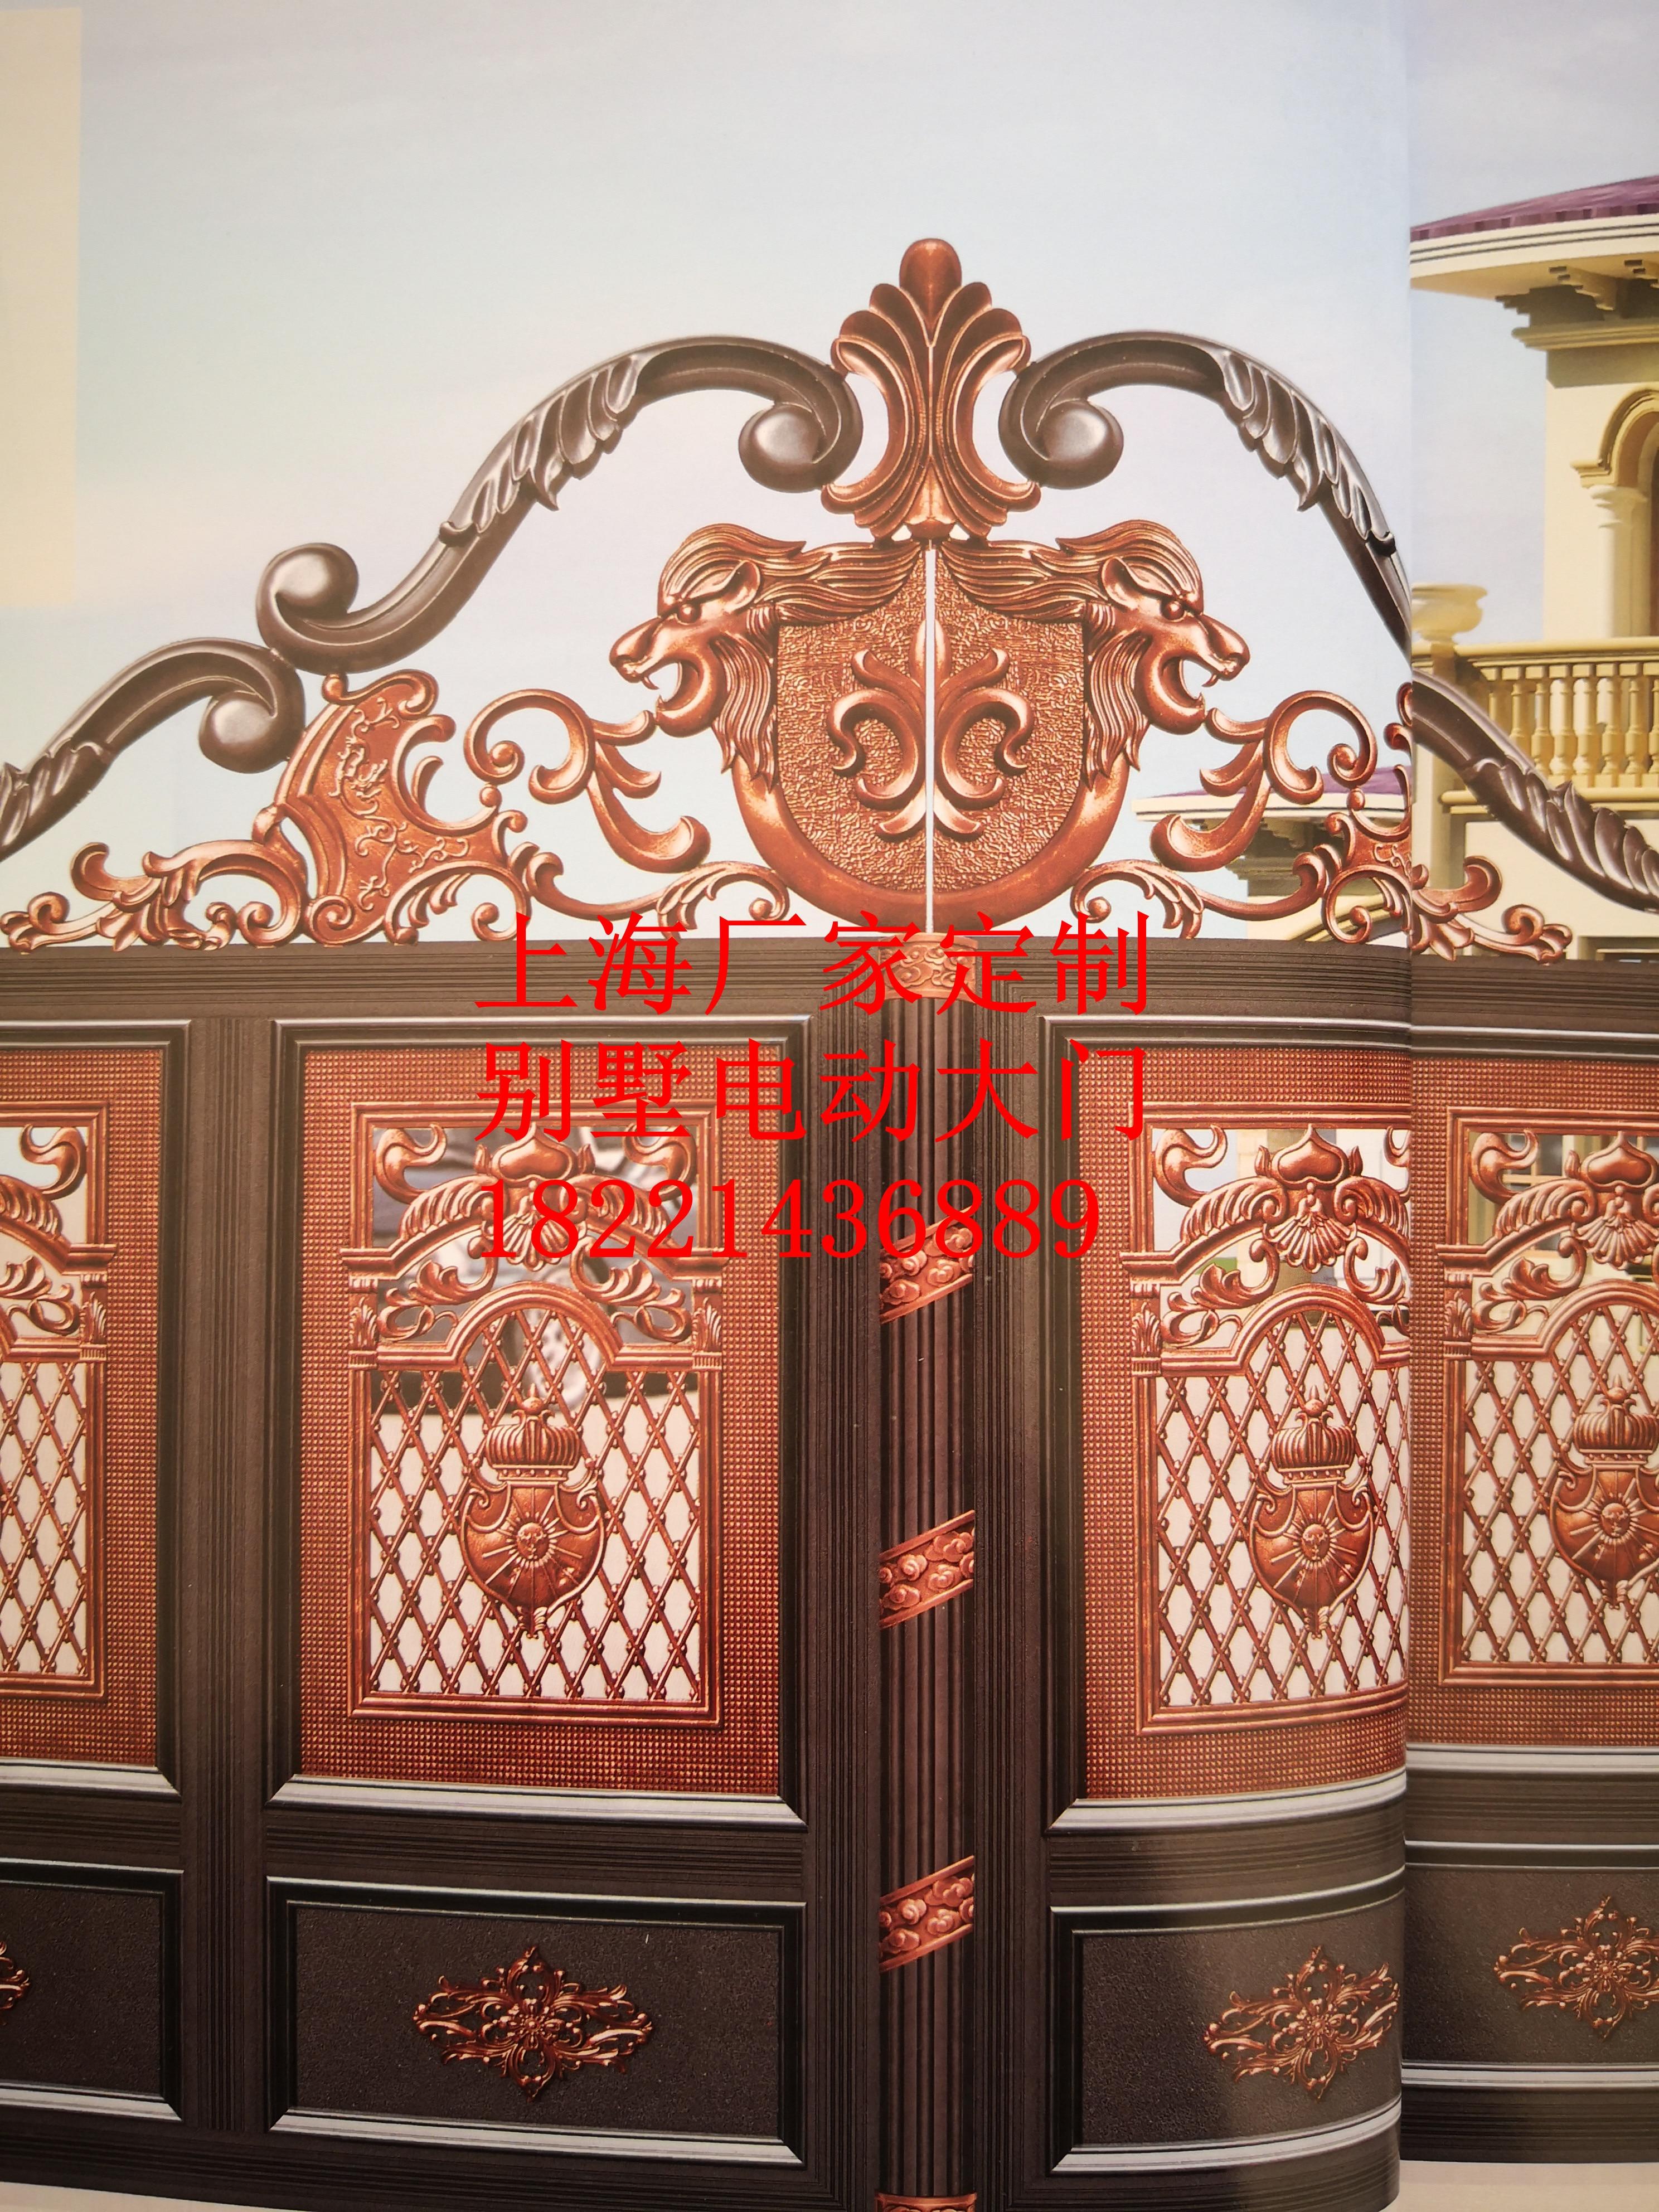 Shanghai Hench  Custom USA Australia Home Use Decorative Iron Gates And Railings